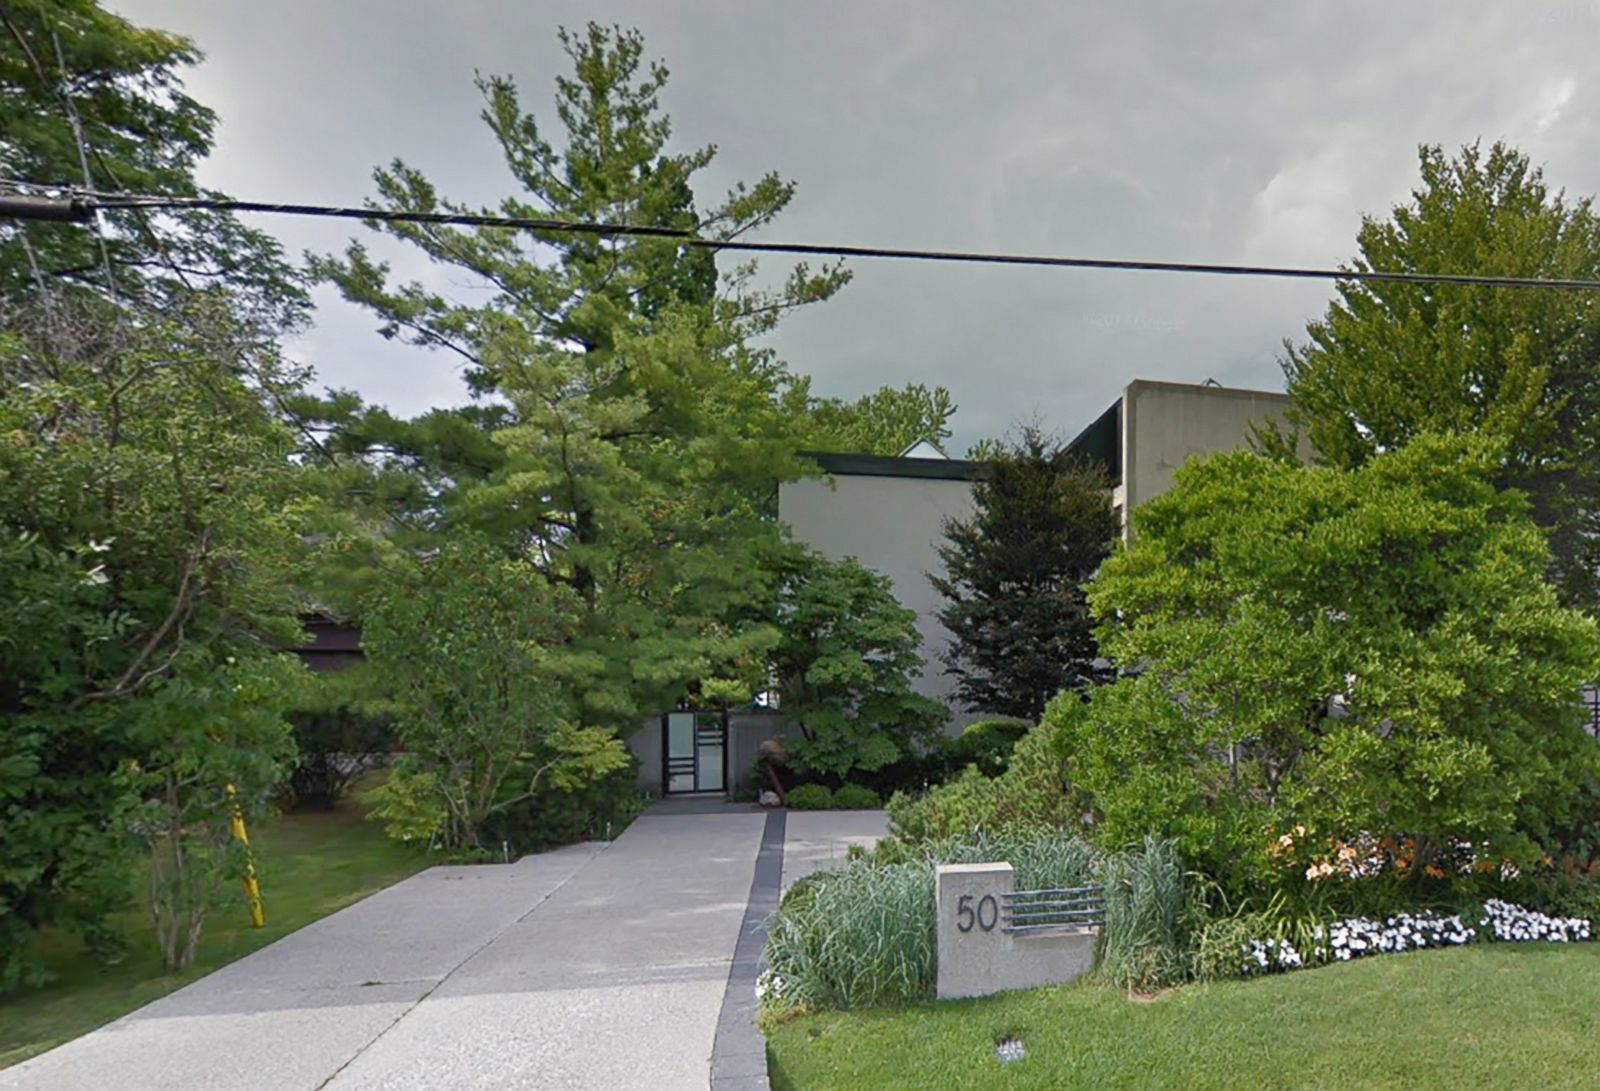 Billionaire Barry Sherman, wife found dead in their Toronto